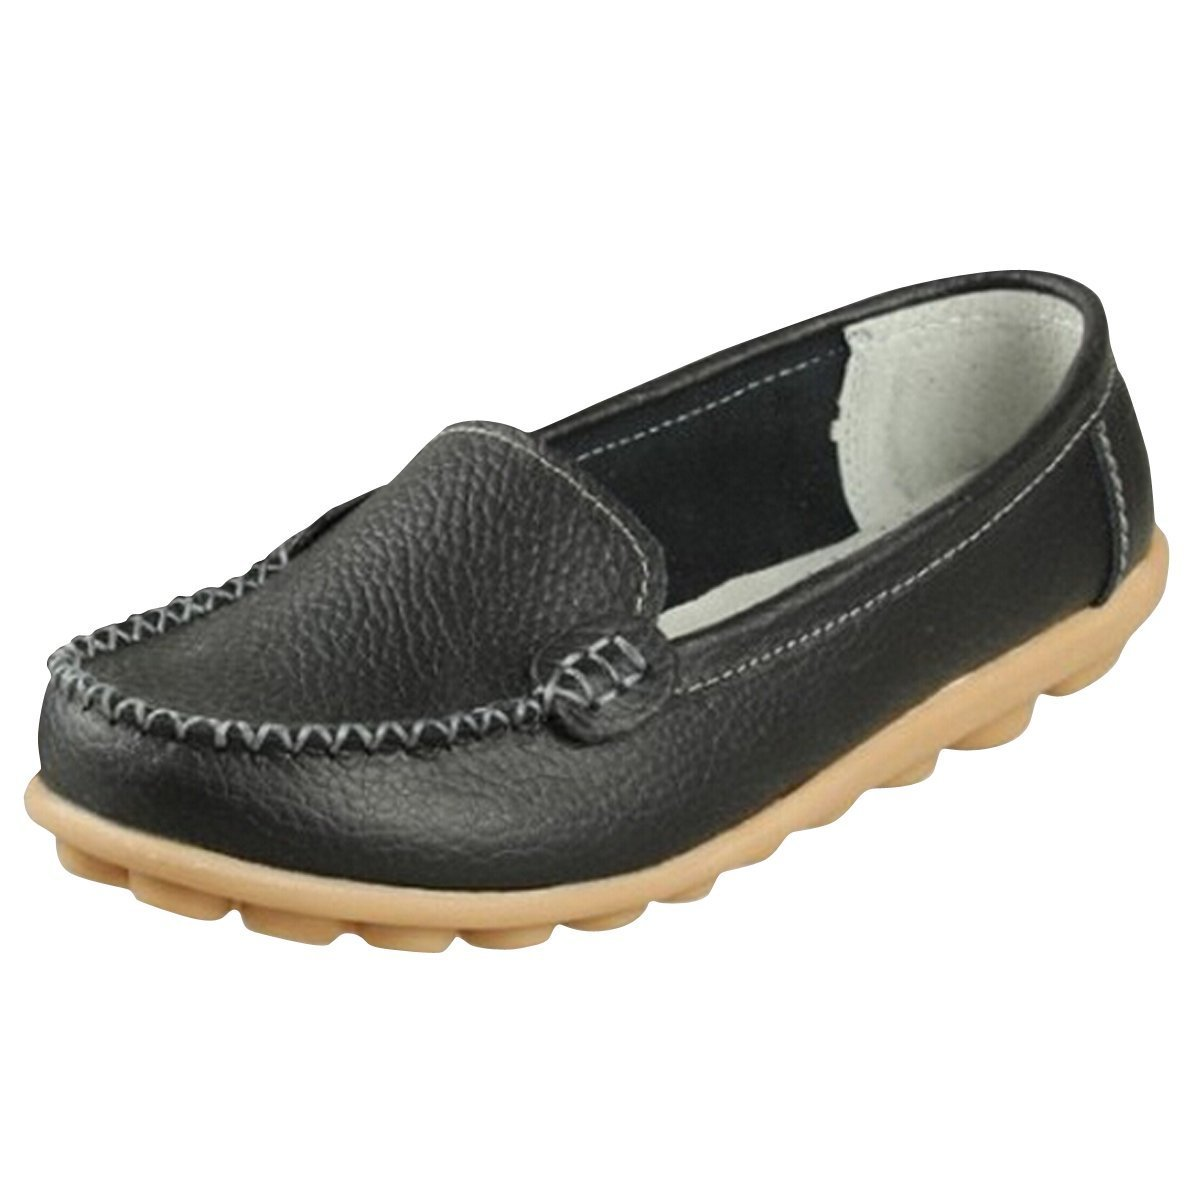 9ad04b28bd1 Minetom Women Comfortable Work Flat Stylish Slip On Moccasins Loafers Flats  Pumps Shoes